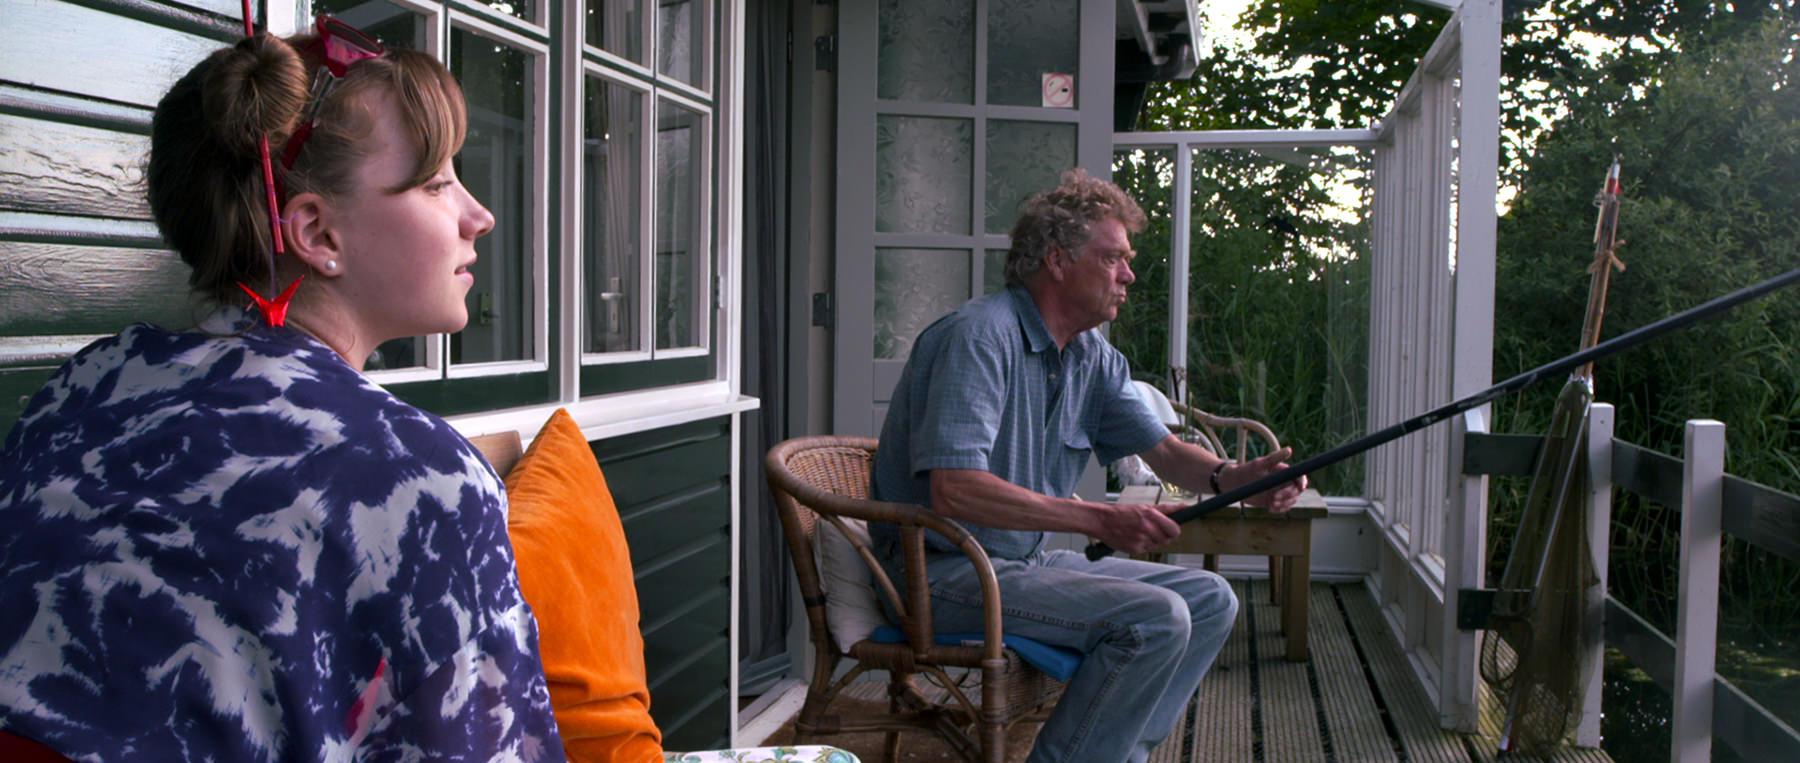 "Filmstill uit ""2 Look 4 a View"" met Teuntje Post en Joop Wittermans"